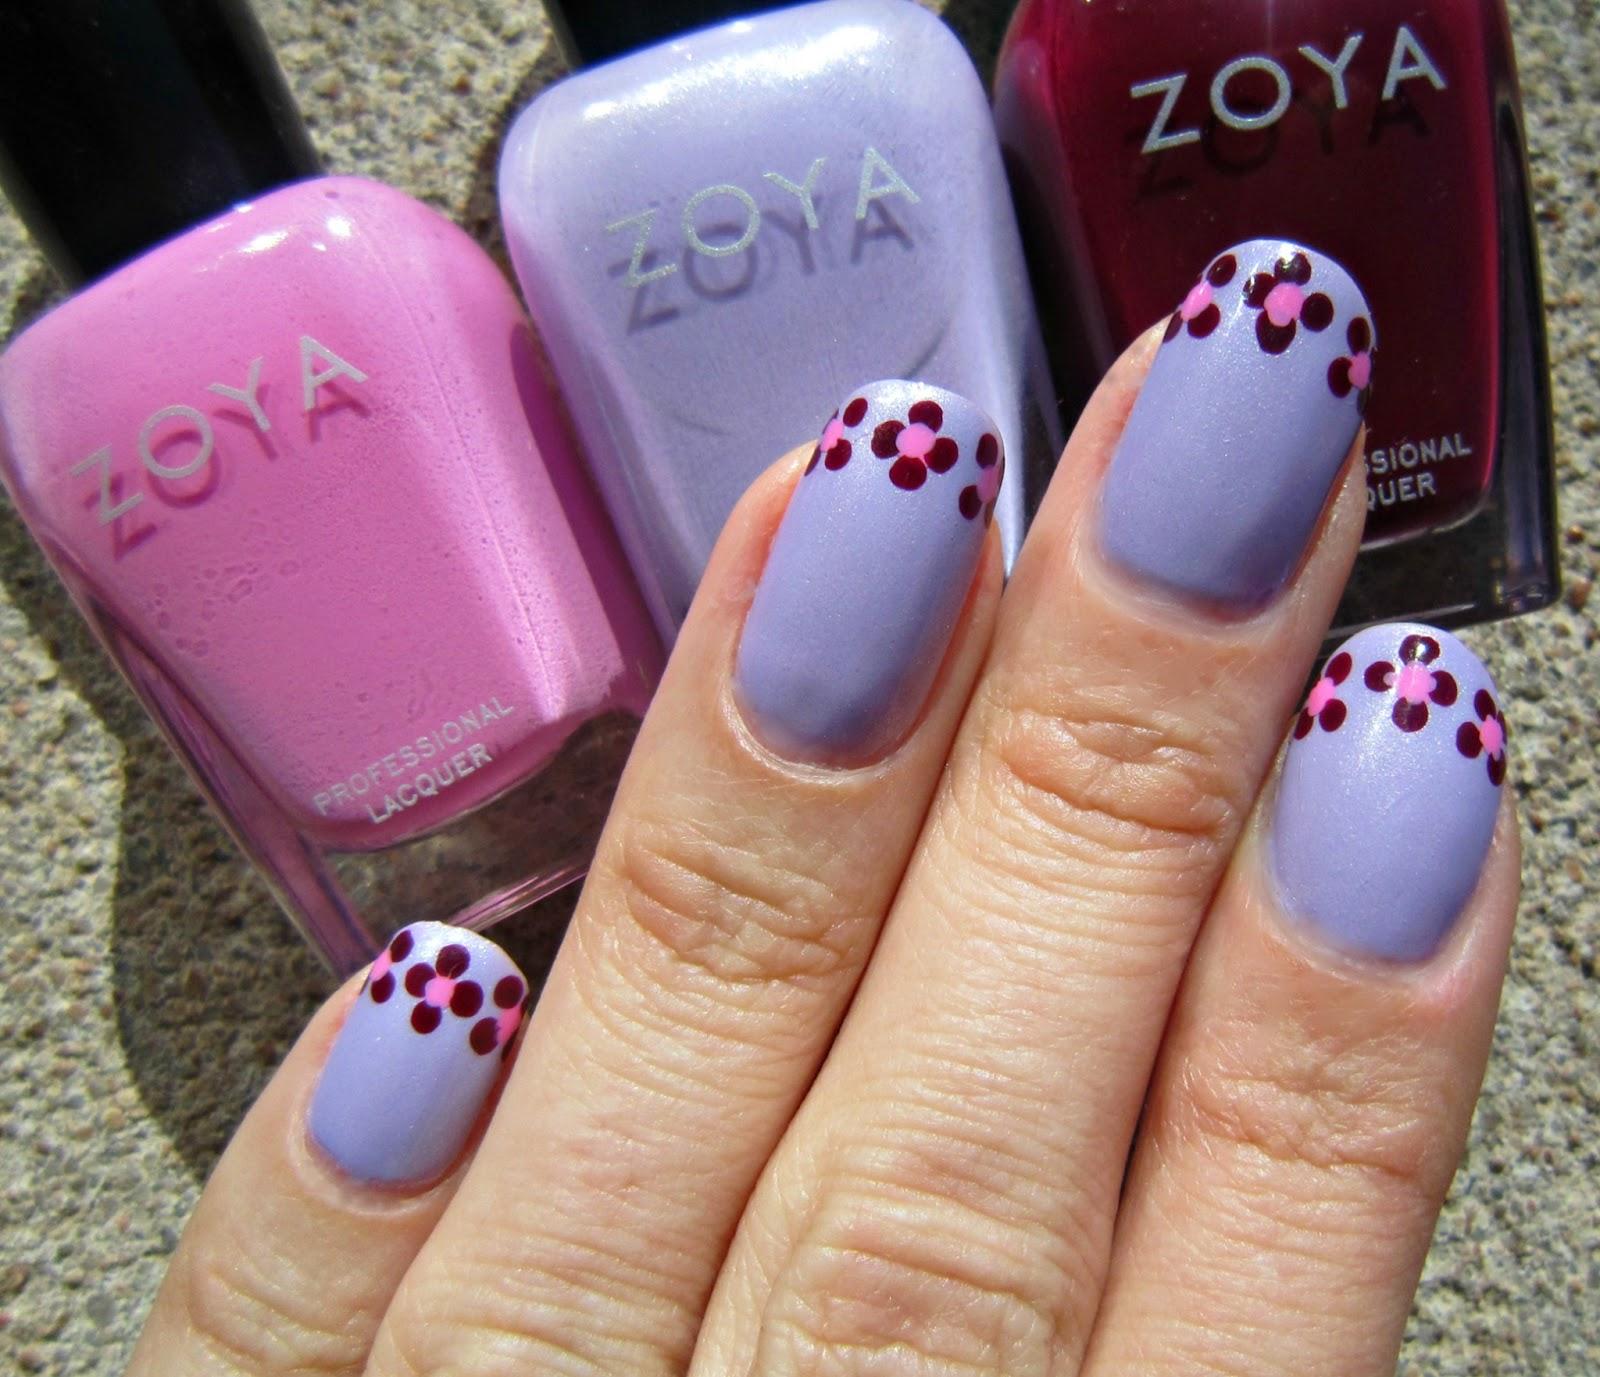 Nail Polish Designs: Concrete And Nail Polish: Zoya Dotted Flower French